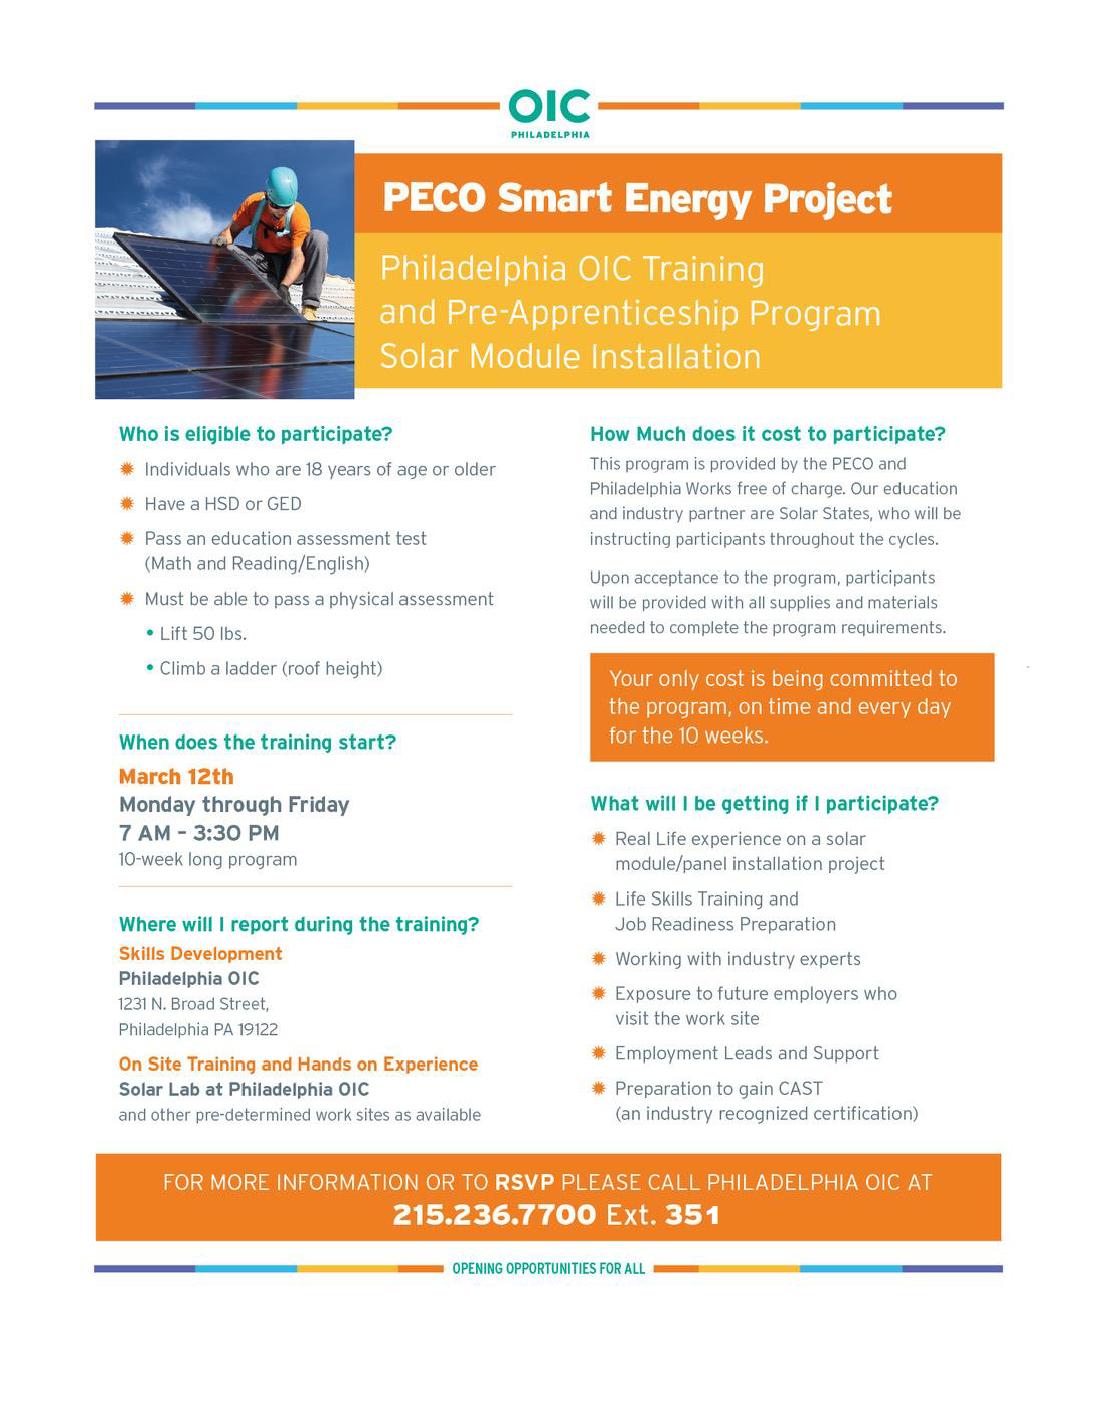 Philadelphia OIC: Training and Pre-Apprenticeship Program